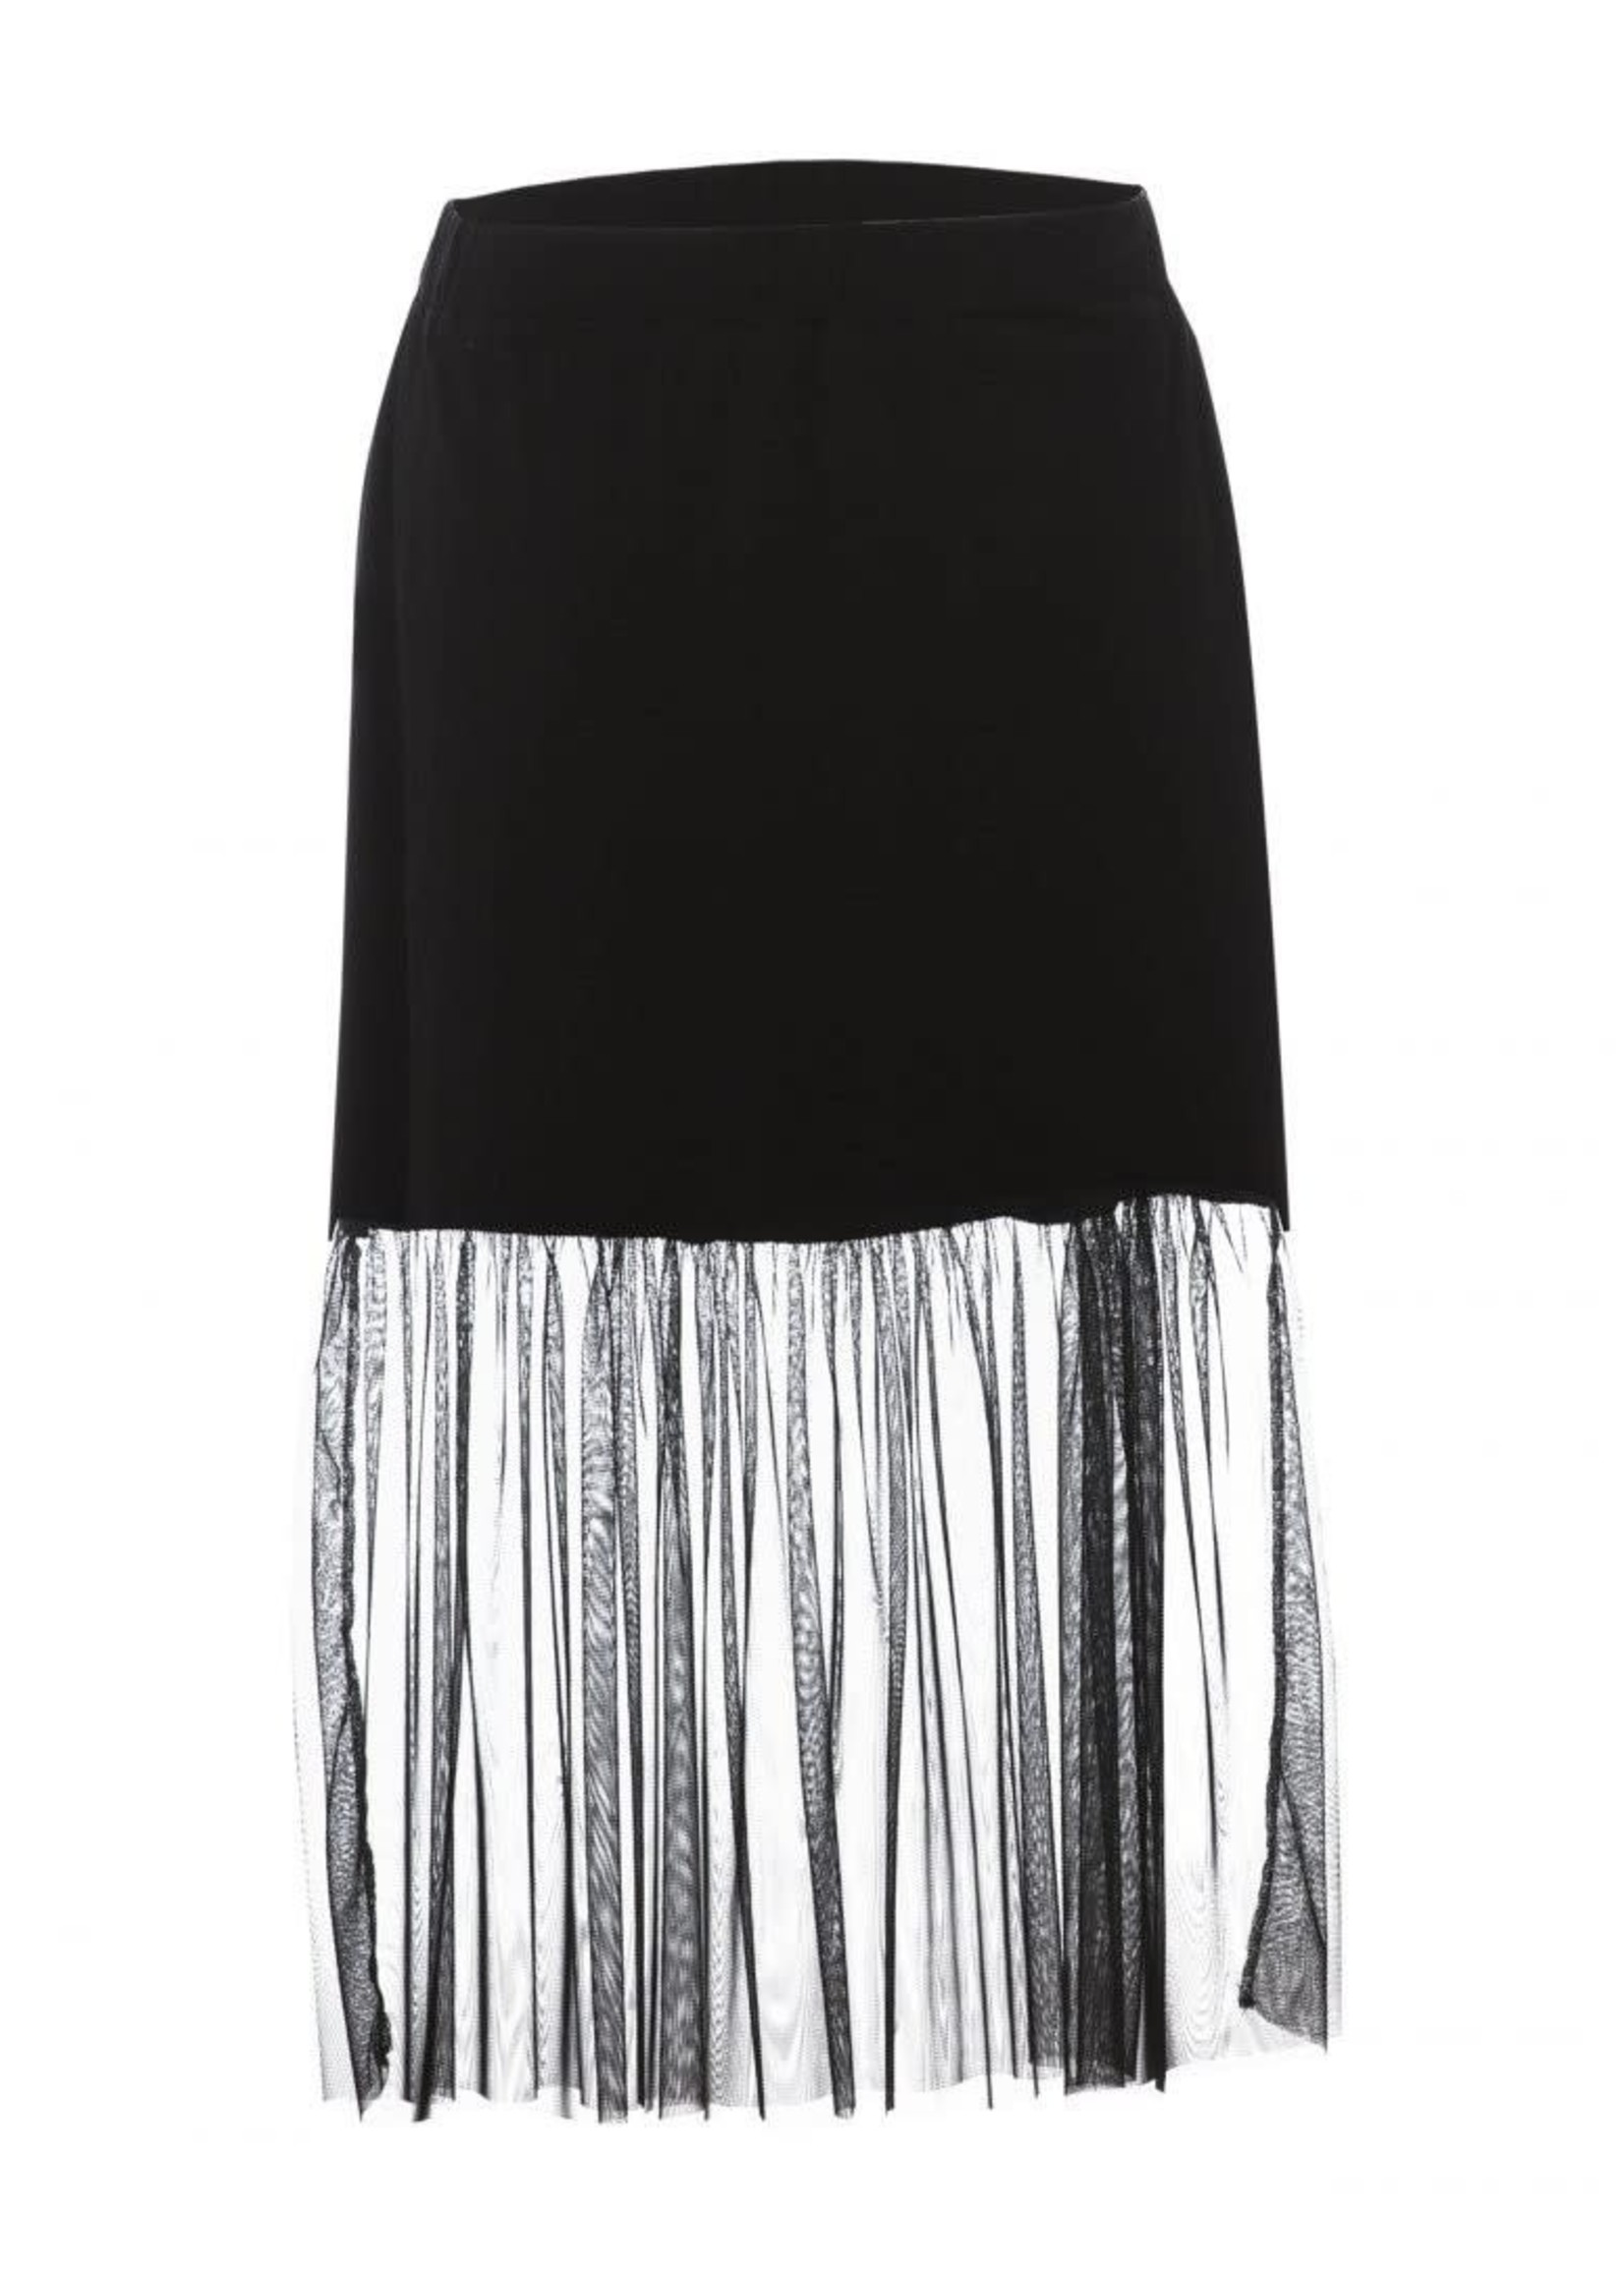 LUUKAA 20y402 carmen skirt black